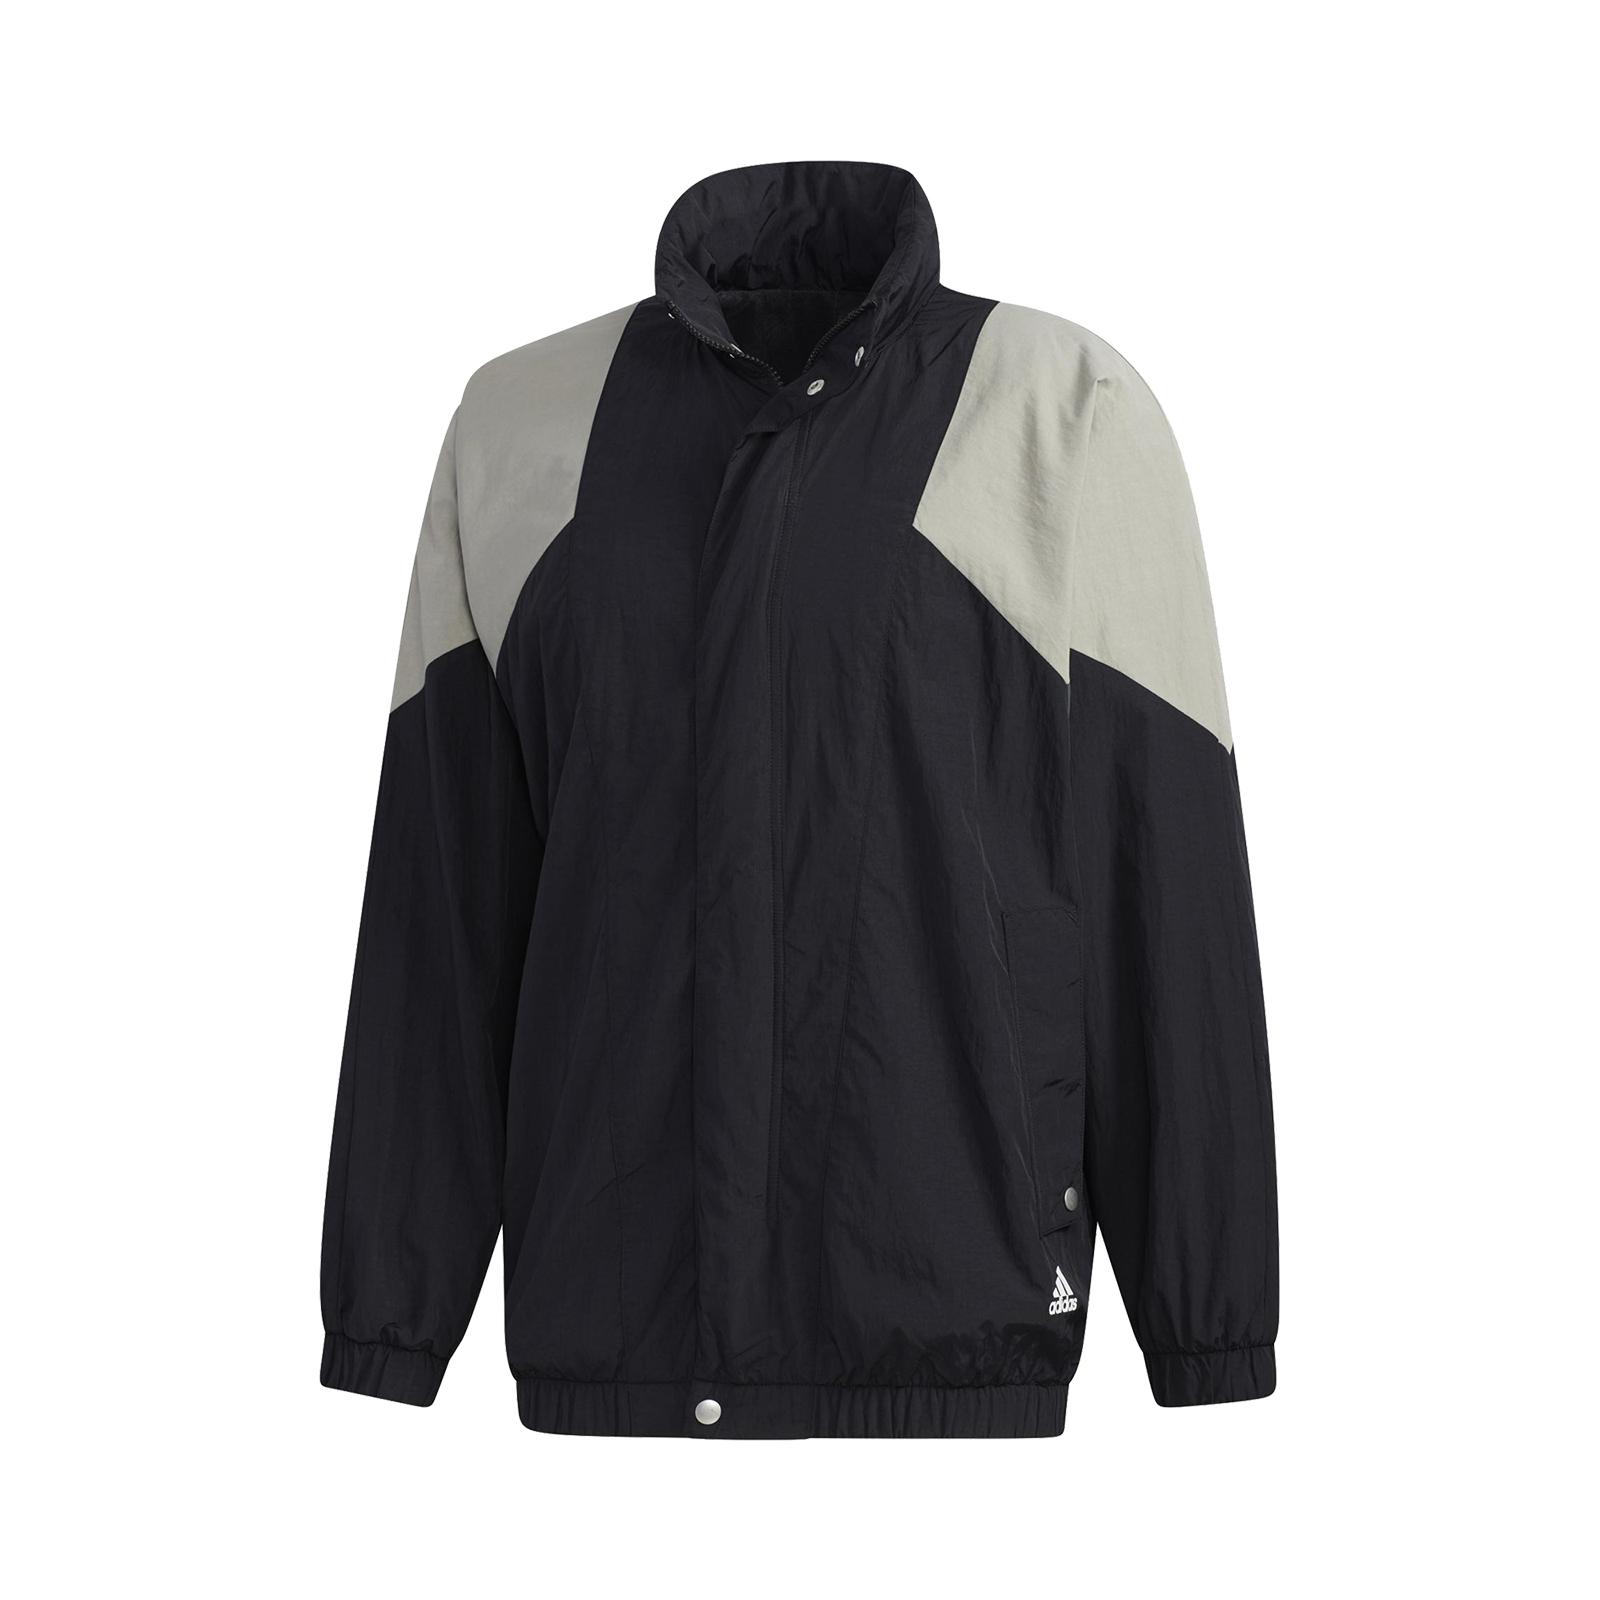 Adidas 外套 Must Haves Woven Jackets 黑 灰 男款 風衣 愛迪達【ACS】 GE0386